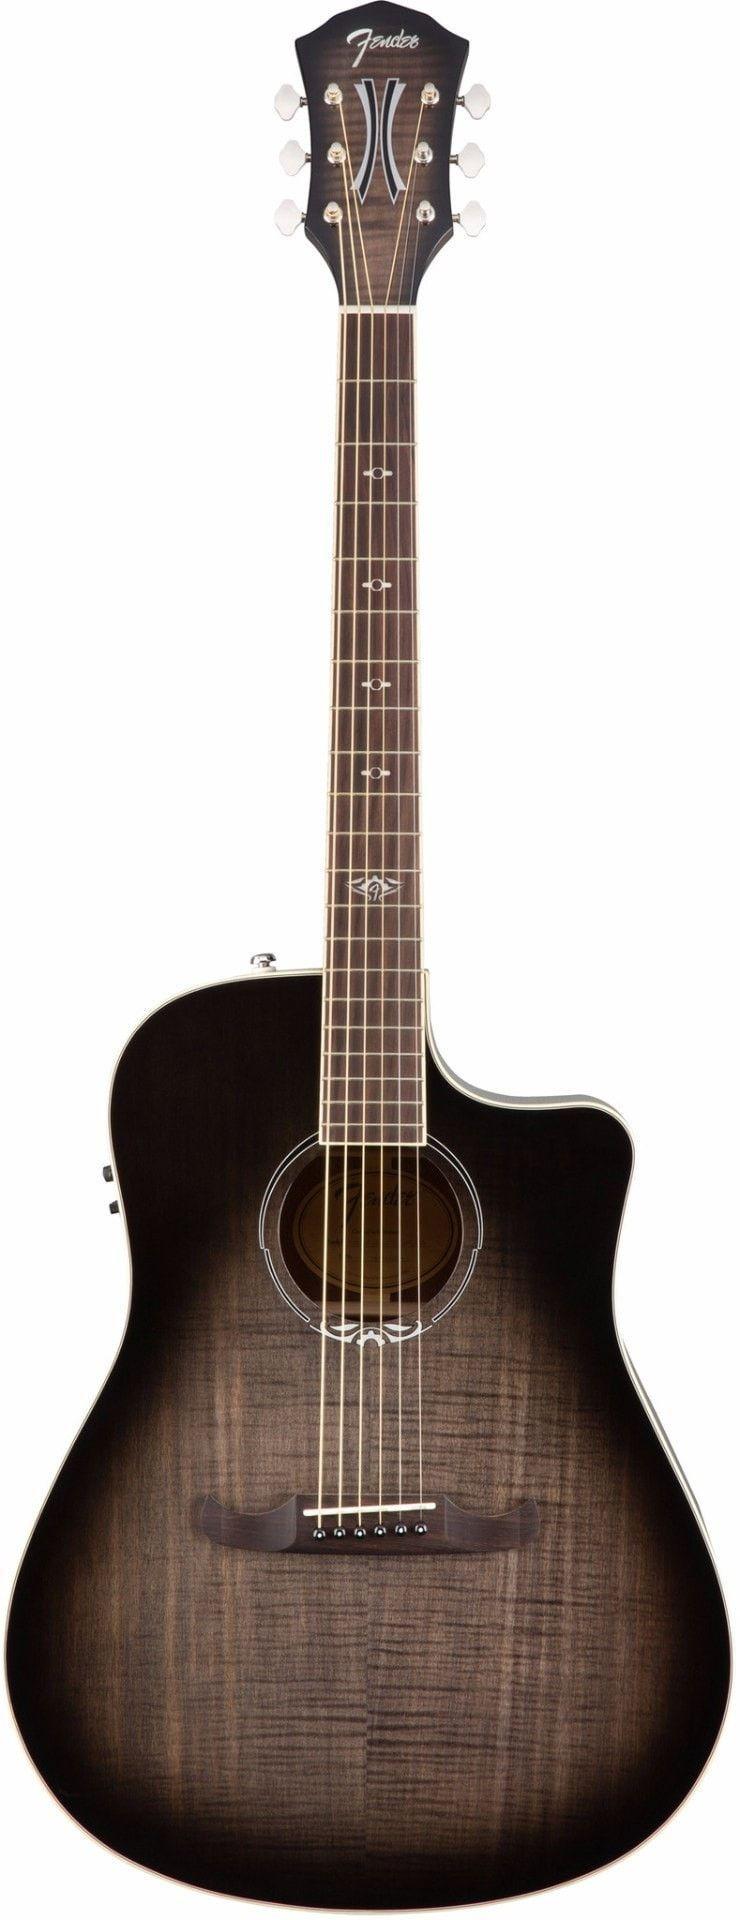 fender t bucket 300ce acoustic electric guitar music fender acoustic guitar guitar learn. Black Bedroom Furniture Sets. Home Design Ideas